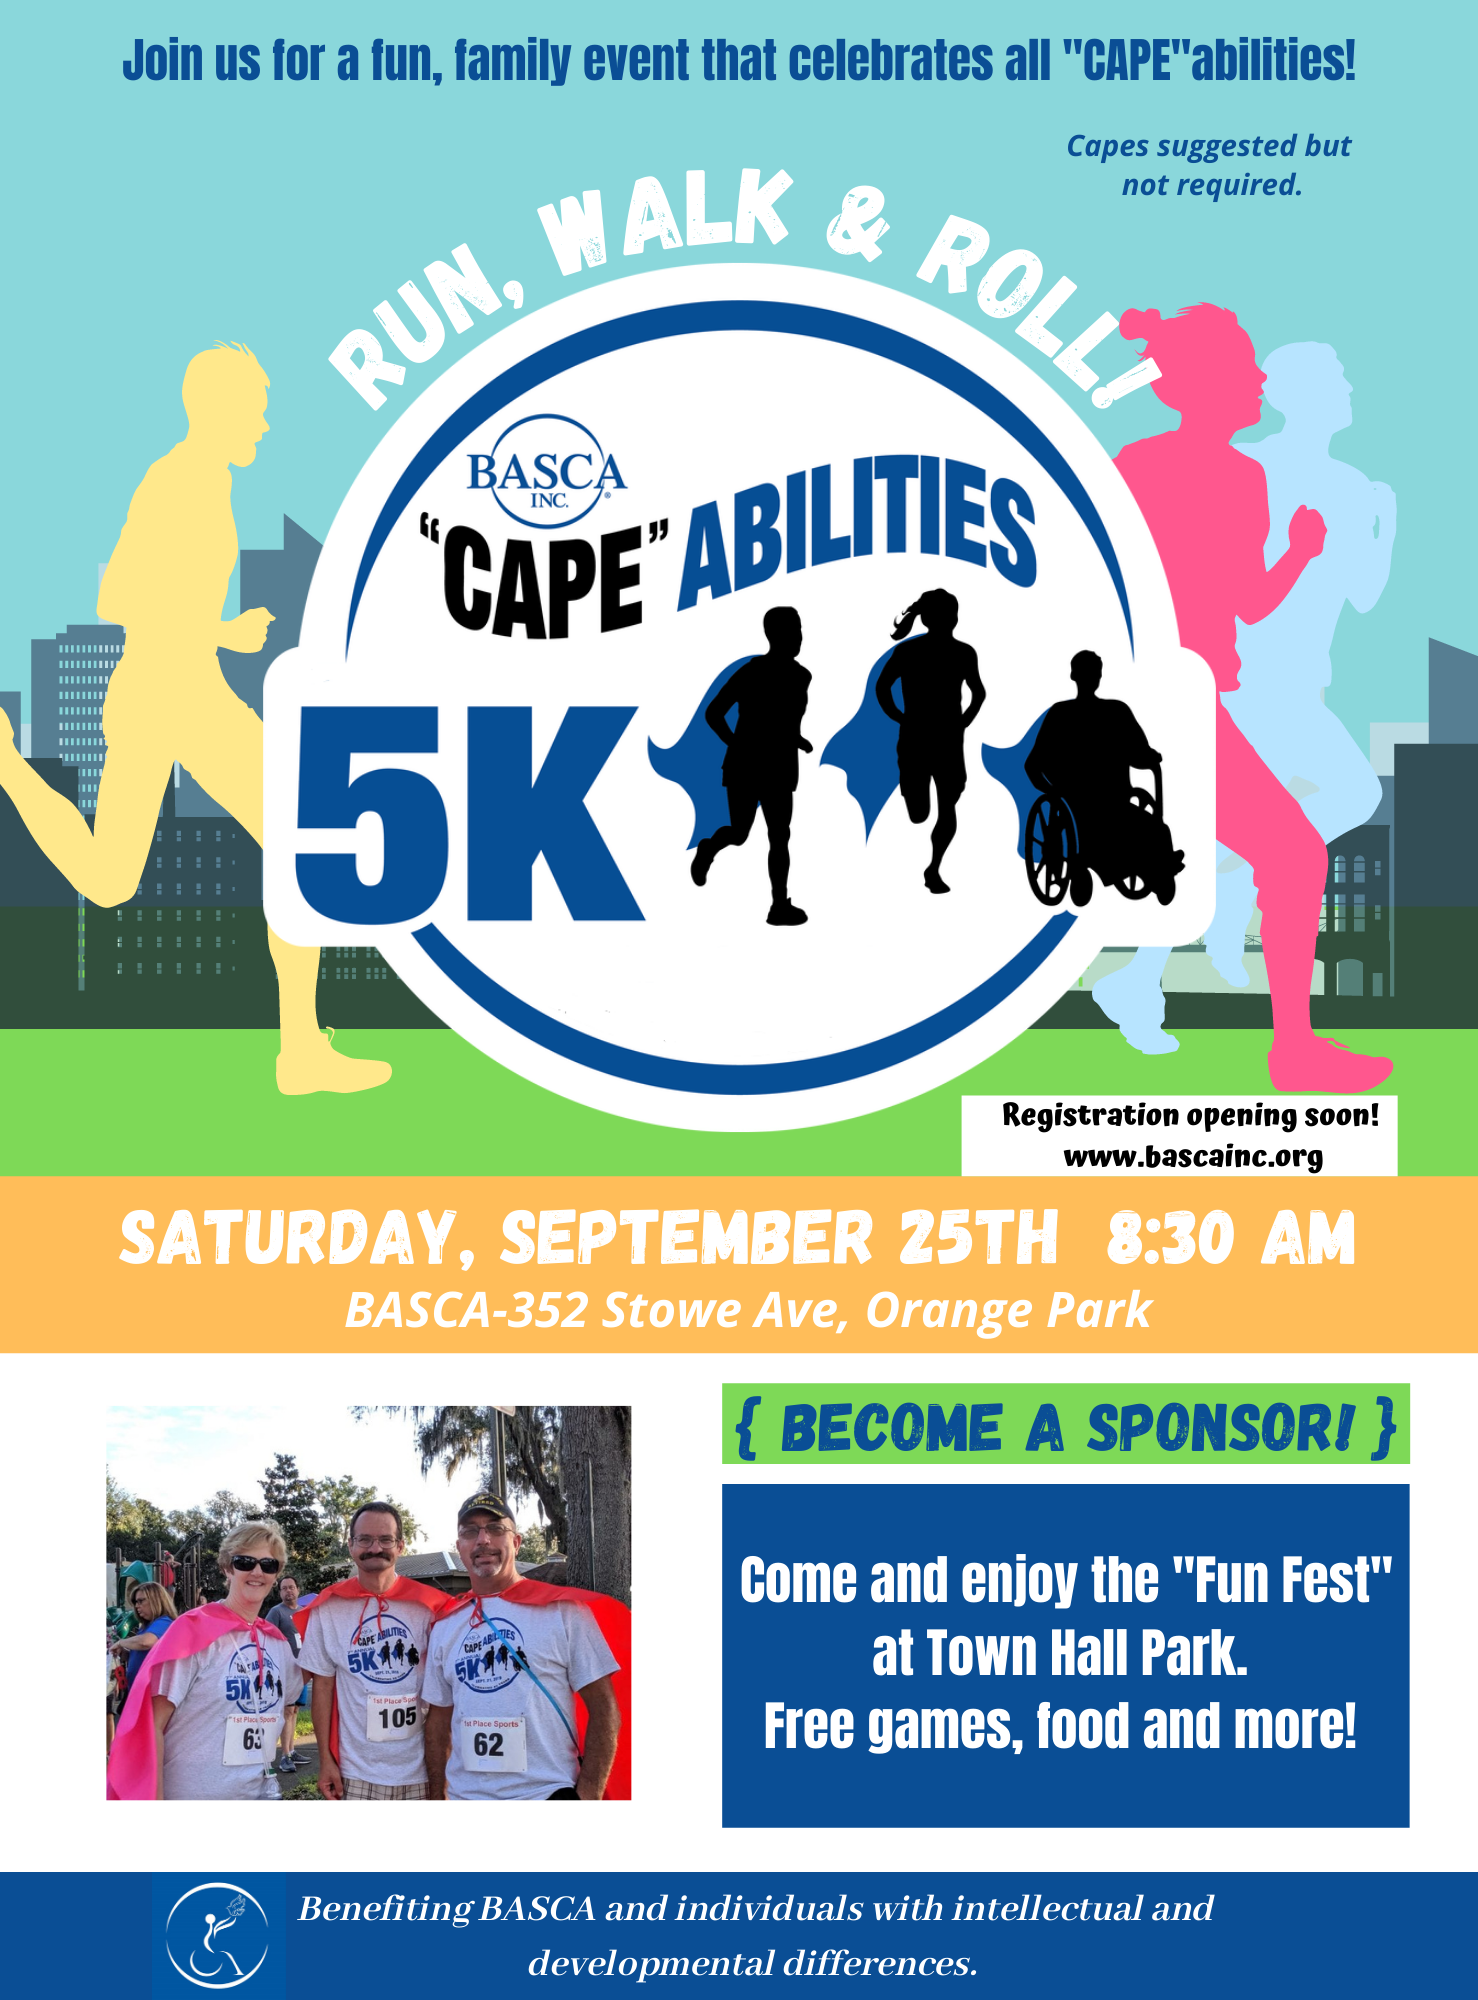 flyer for 5 K event